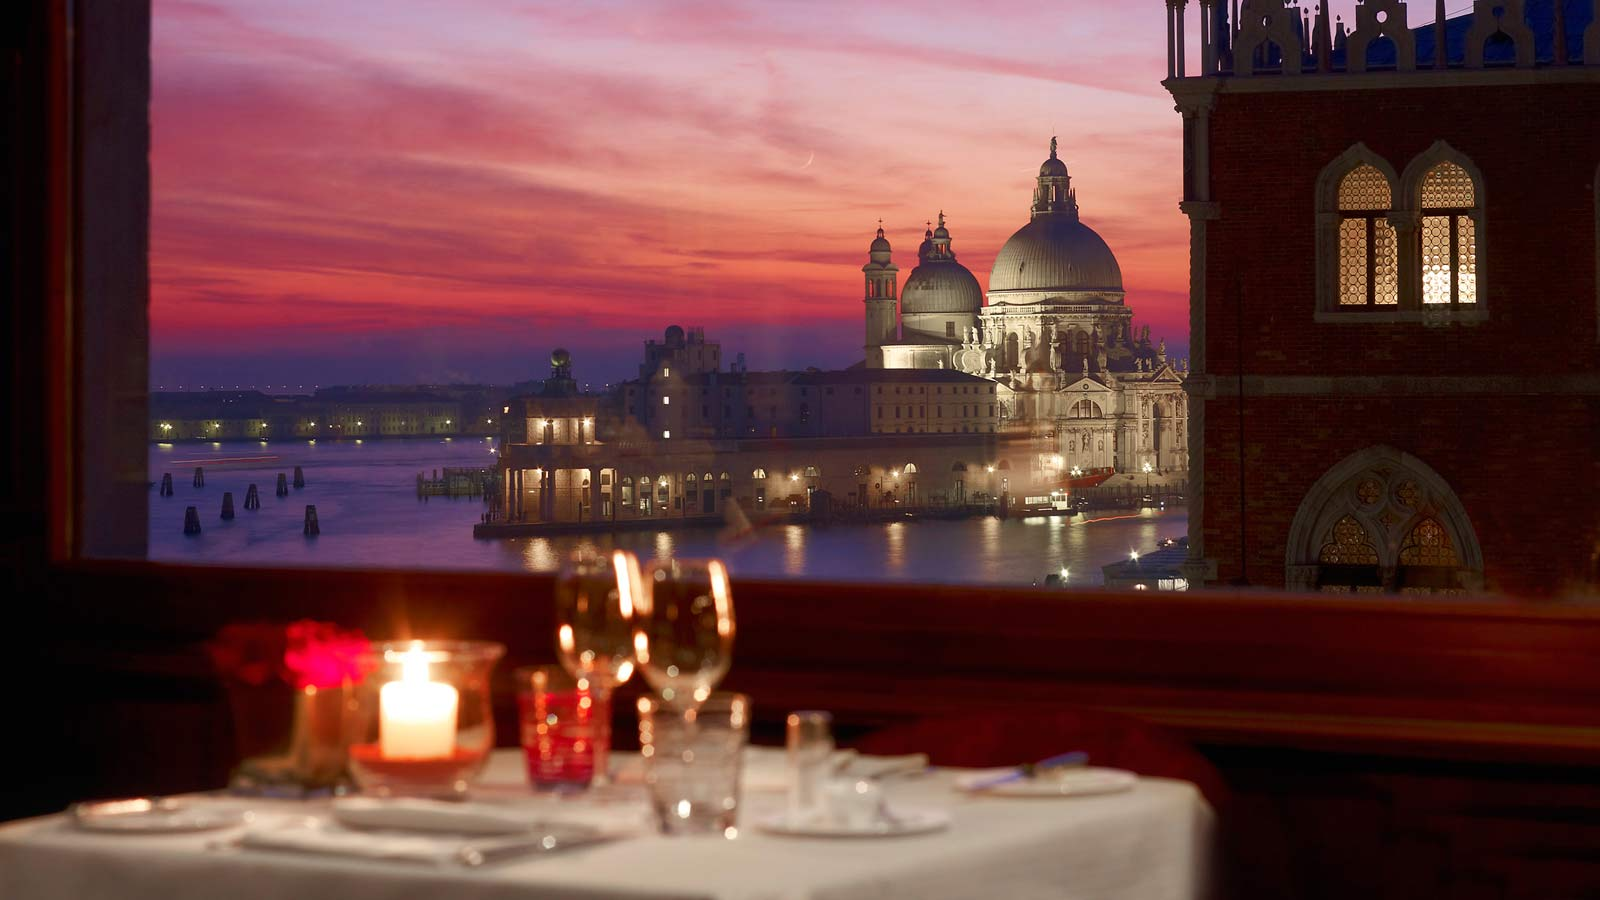 Dinner at the Hotel Danieli